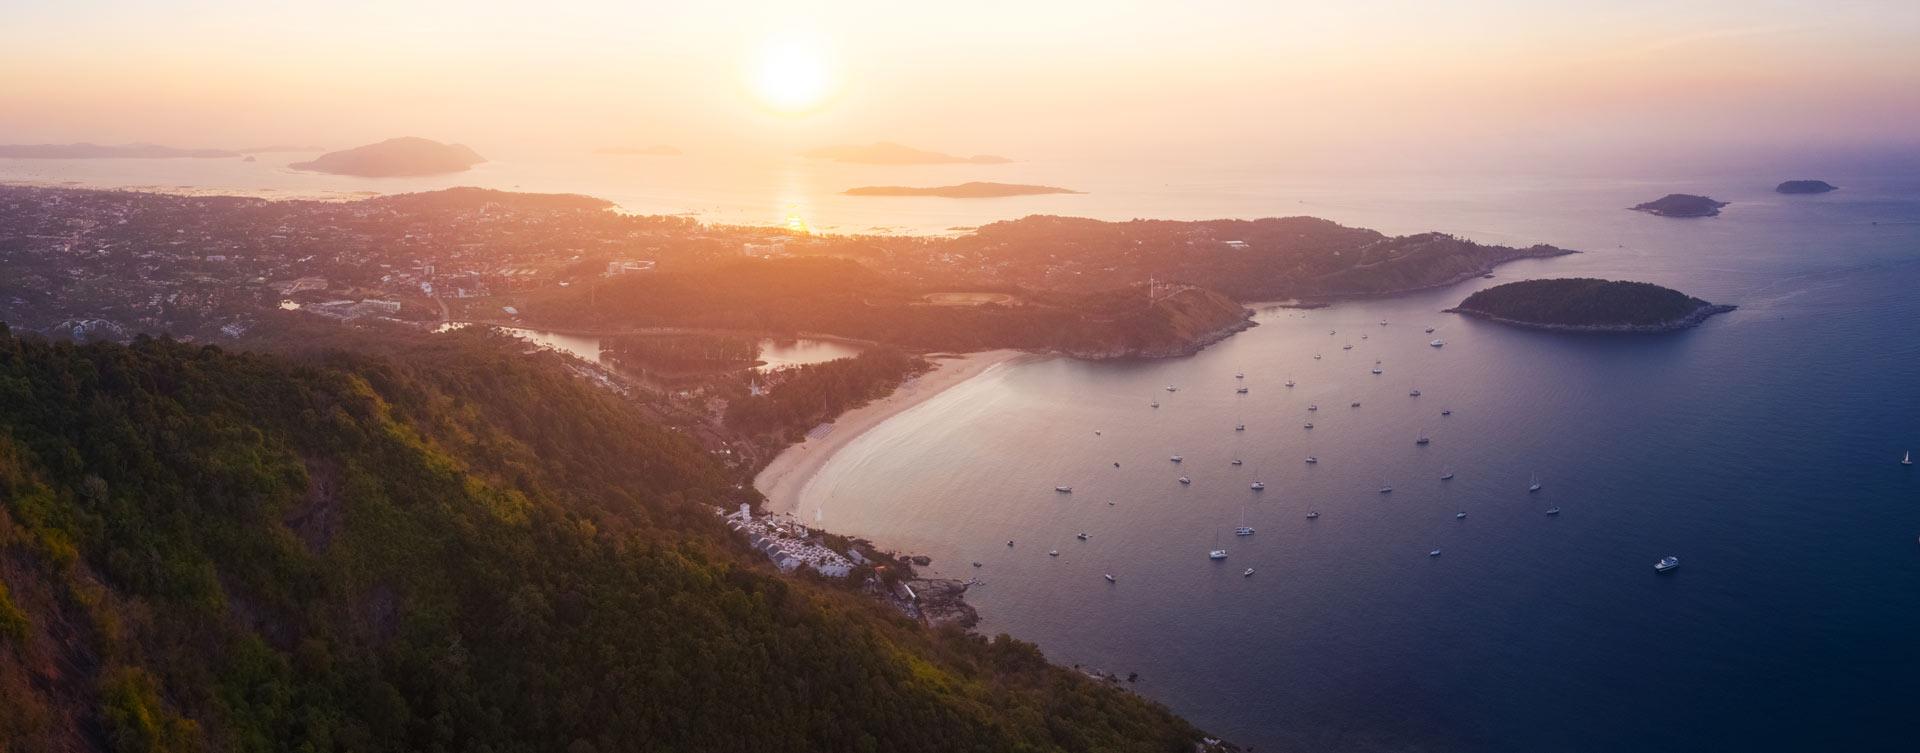 Nai-Harn Beach, Rawai Beach, Promthep Cape, Ayurveda, Wellness, Yoga Retreats, Phuket Thailand, Mangosteen Ayurveda & Wellness Resort, Number 1 Ayurveda Resort in Thailand, Rawai, Phuket.